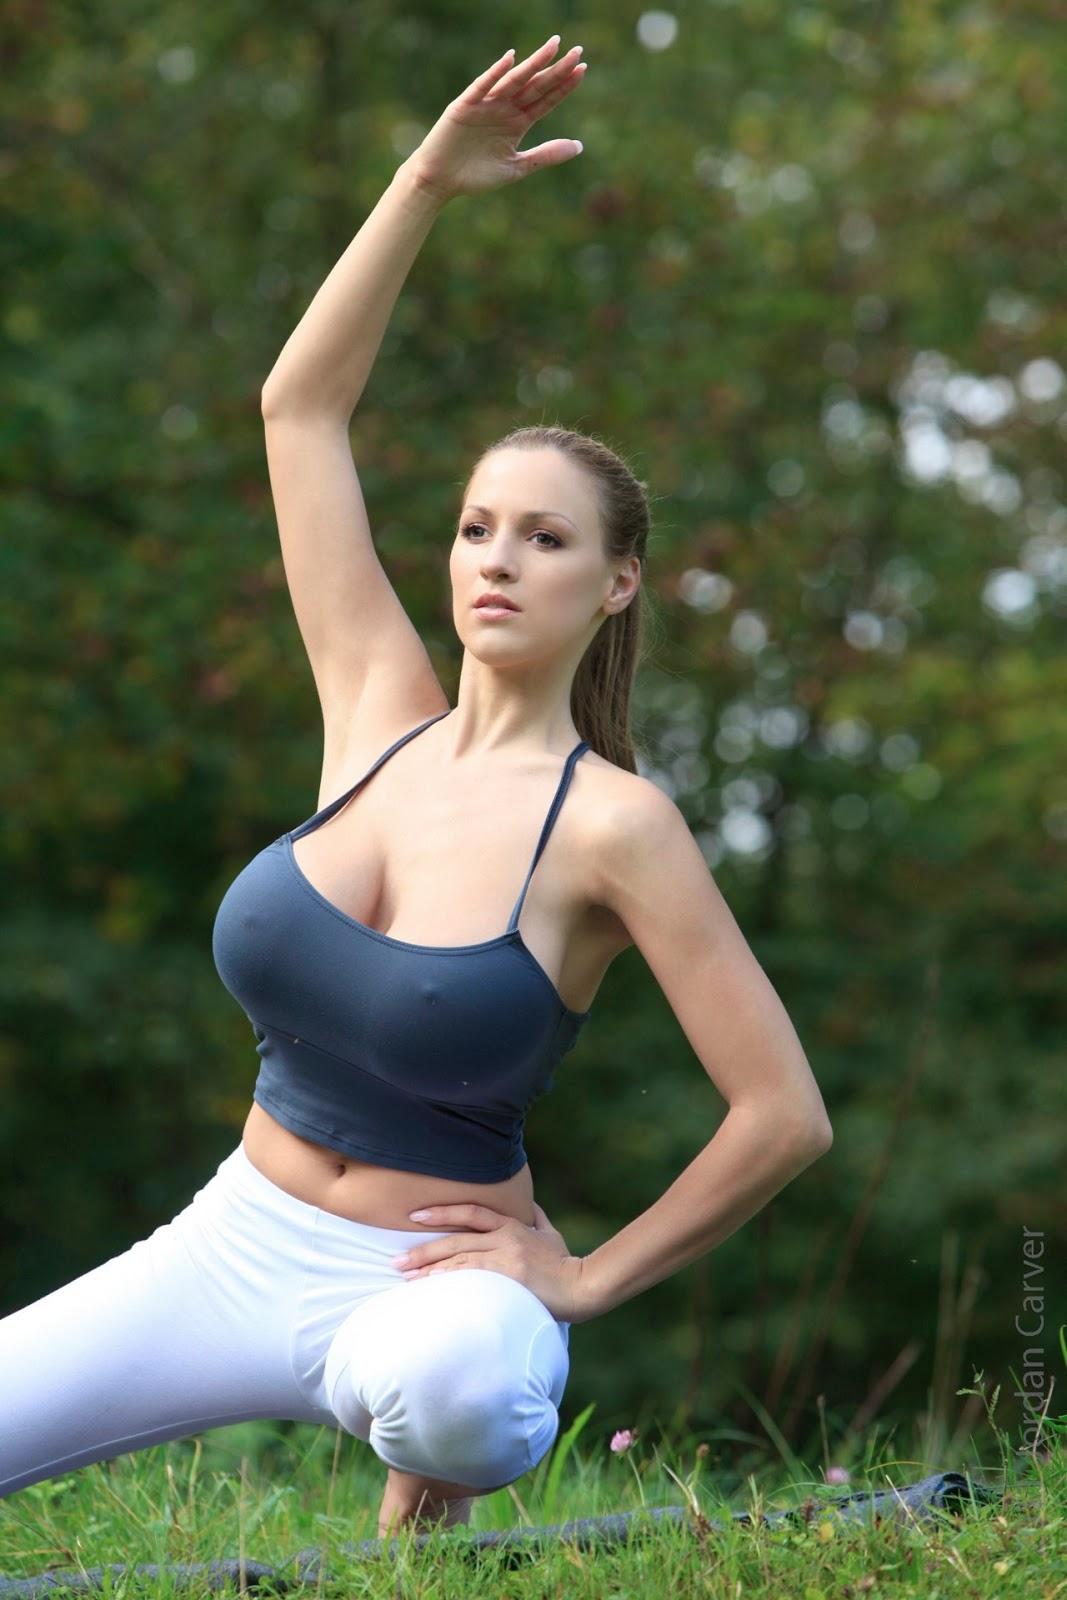 Girls Doing Yoga Sexy